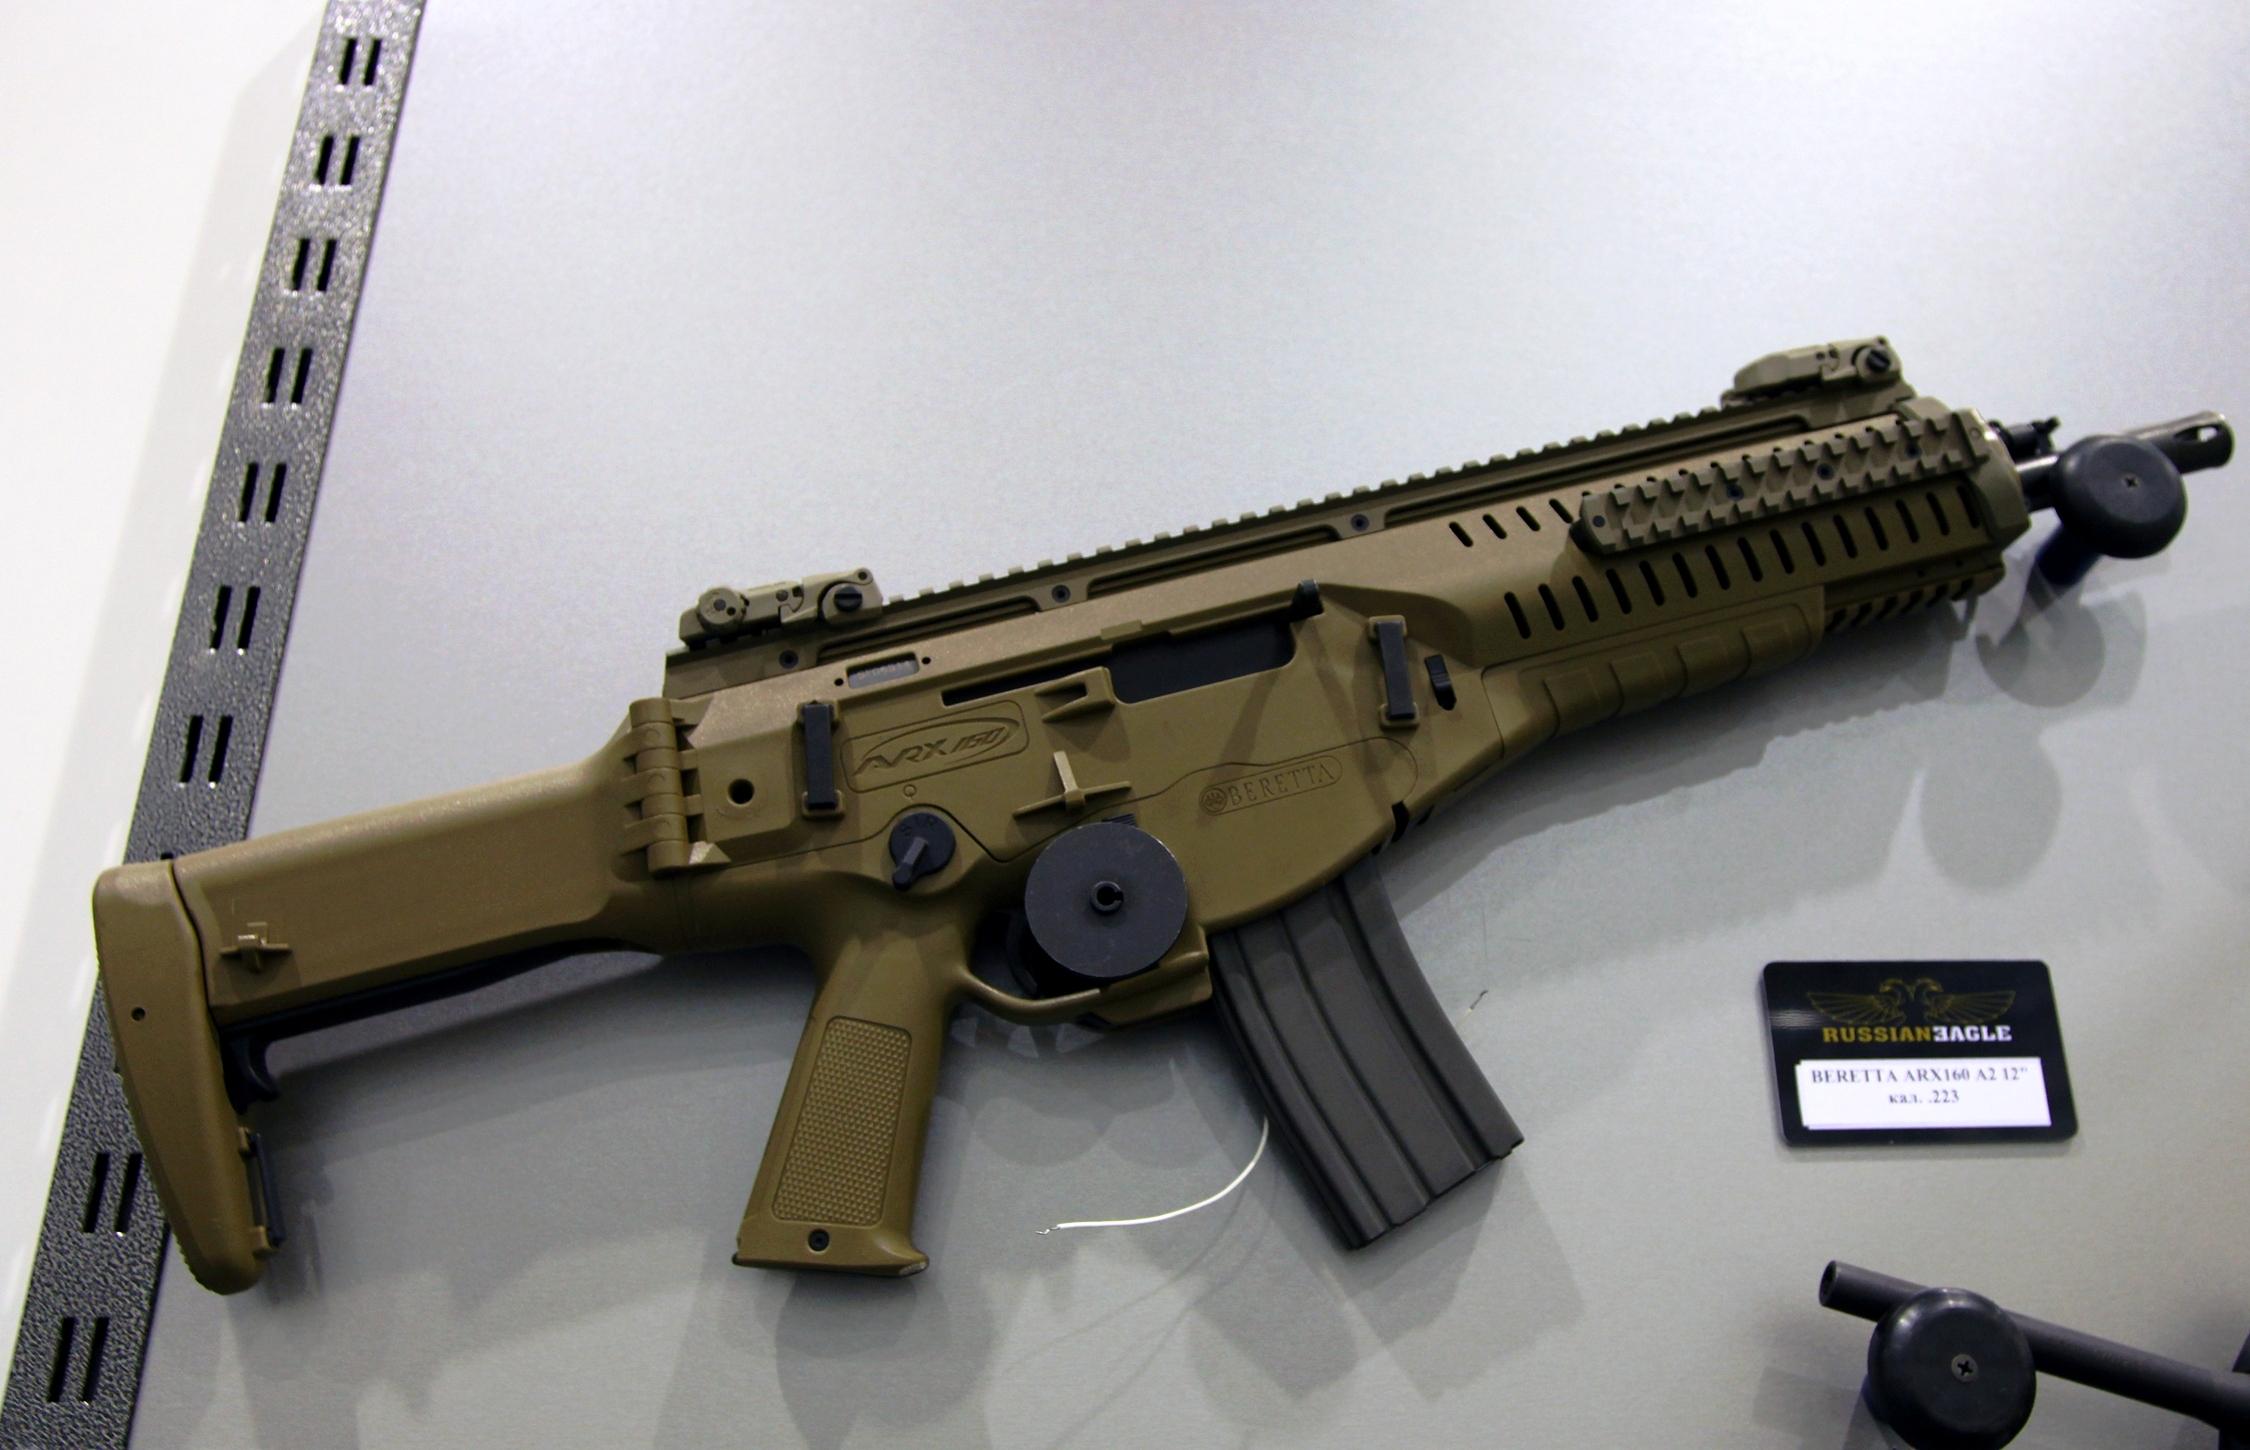 File:M4A1 Carbine.jpg - Wikimedia Commons